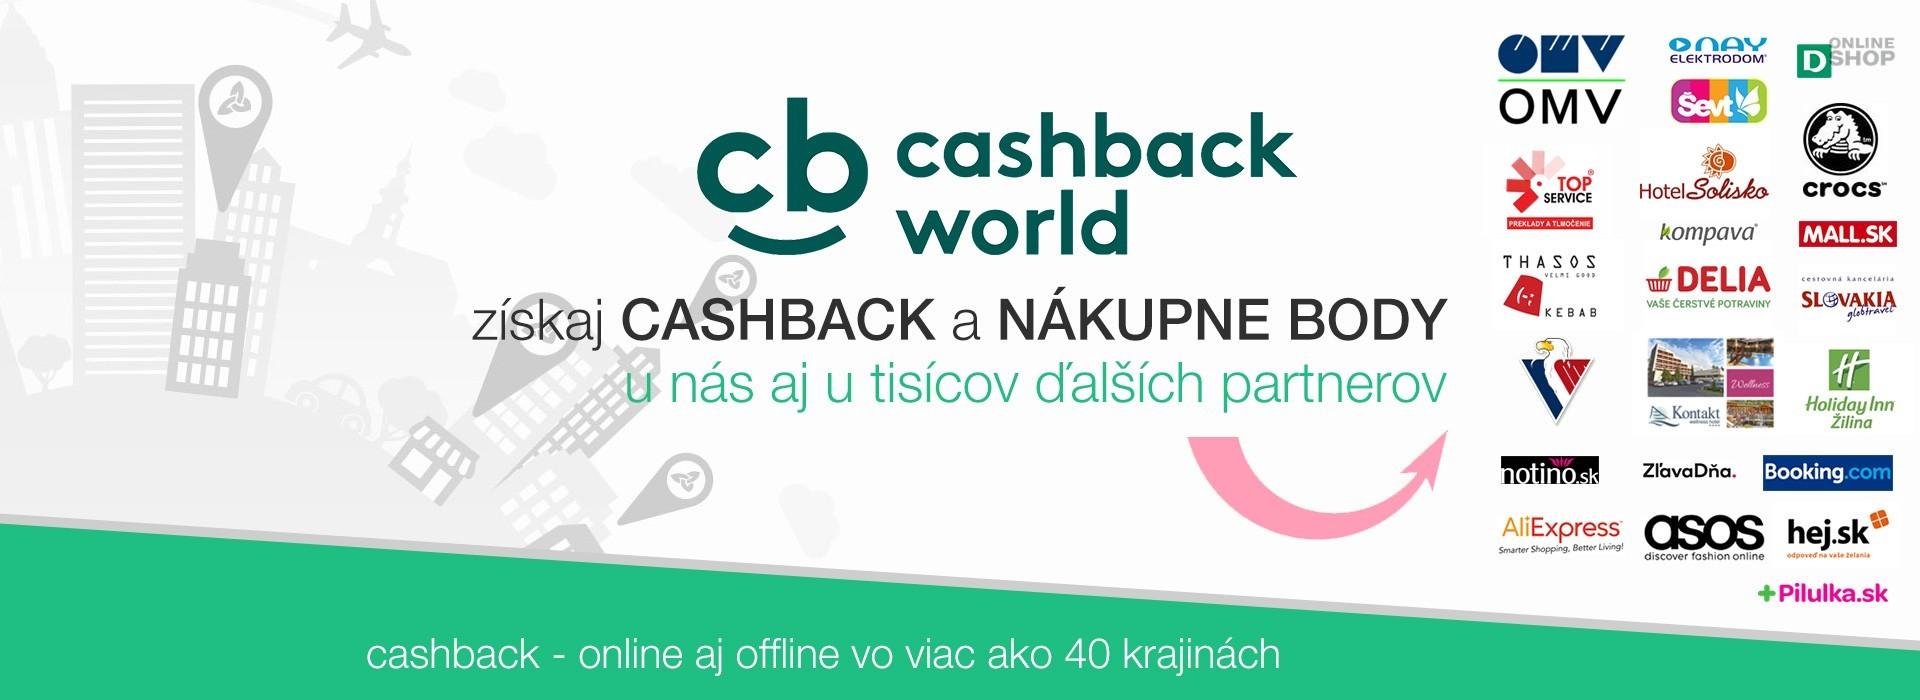 01cashback-1920x700-02